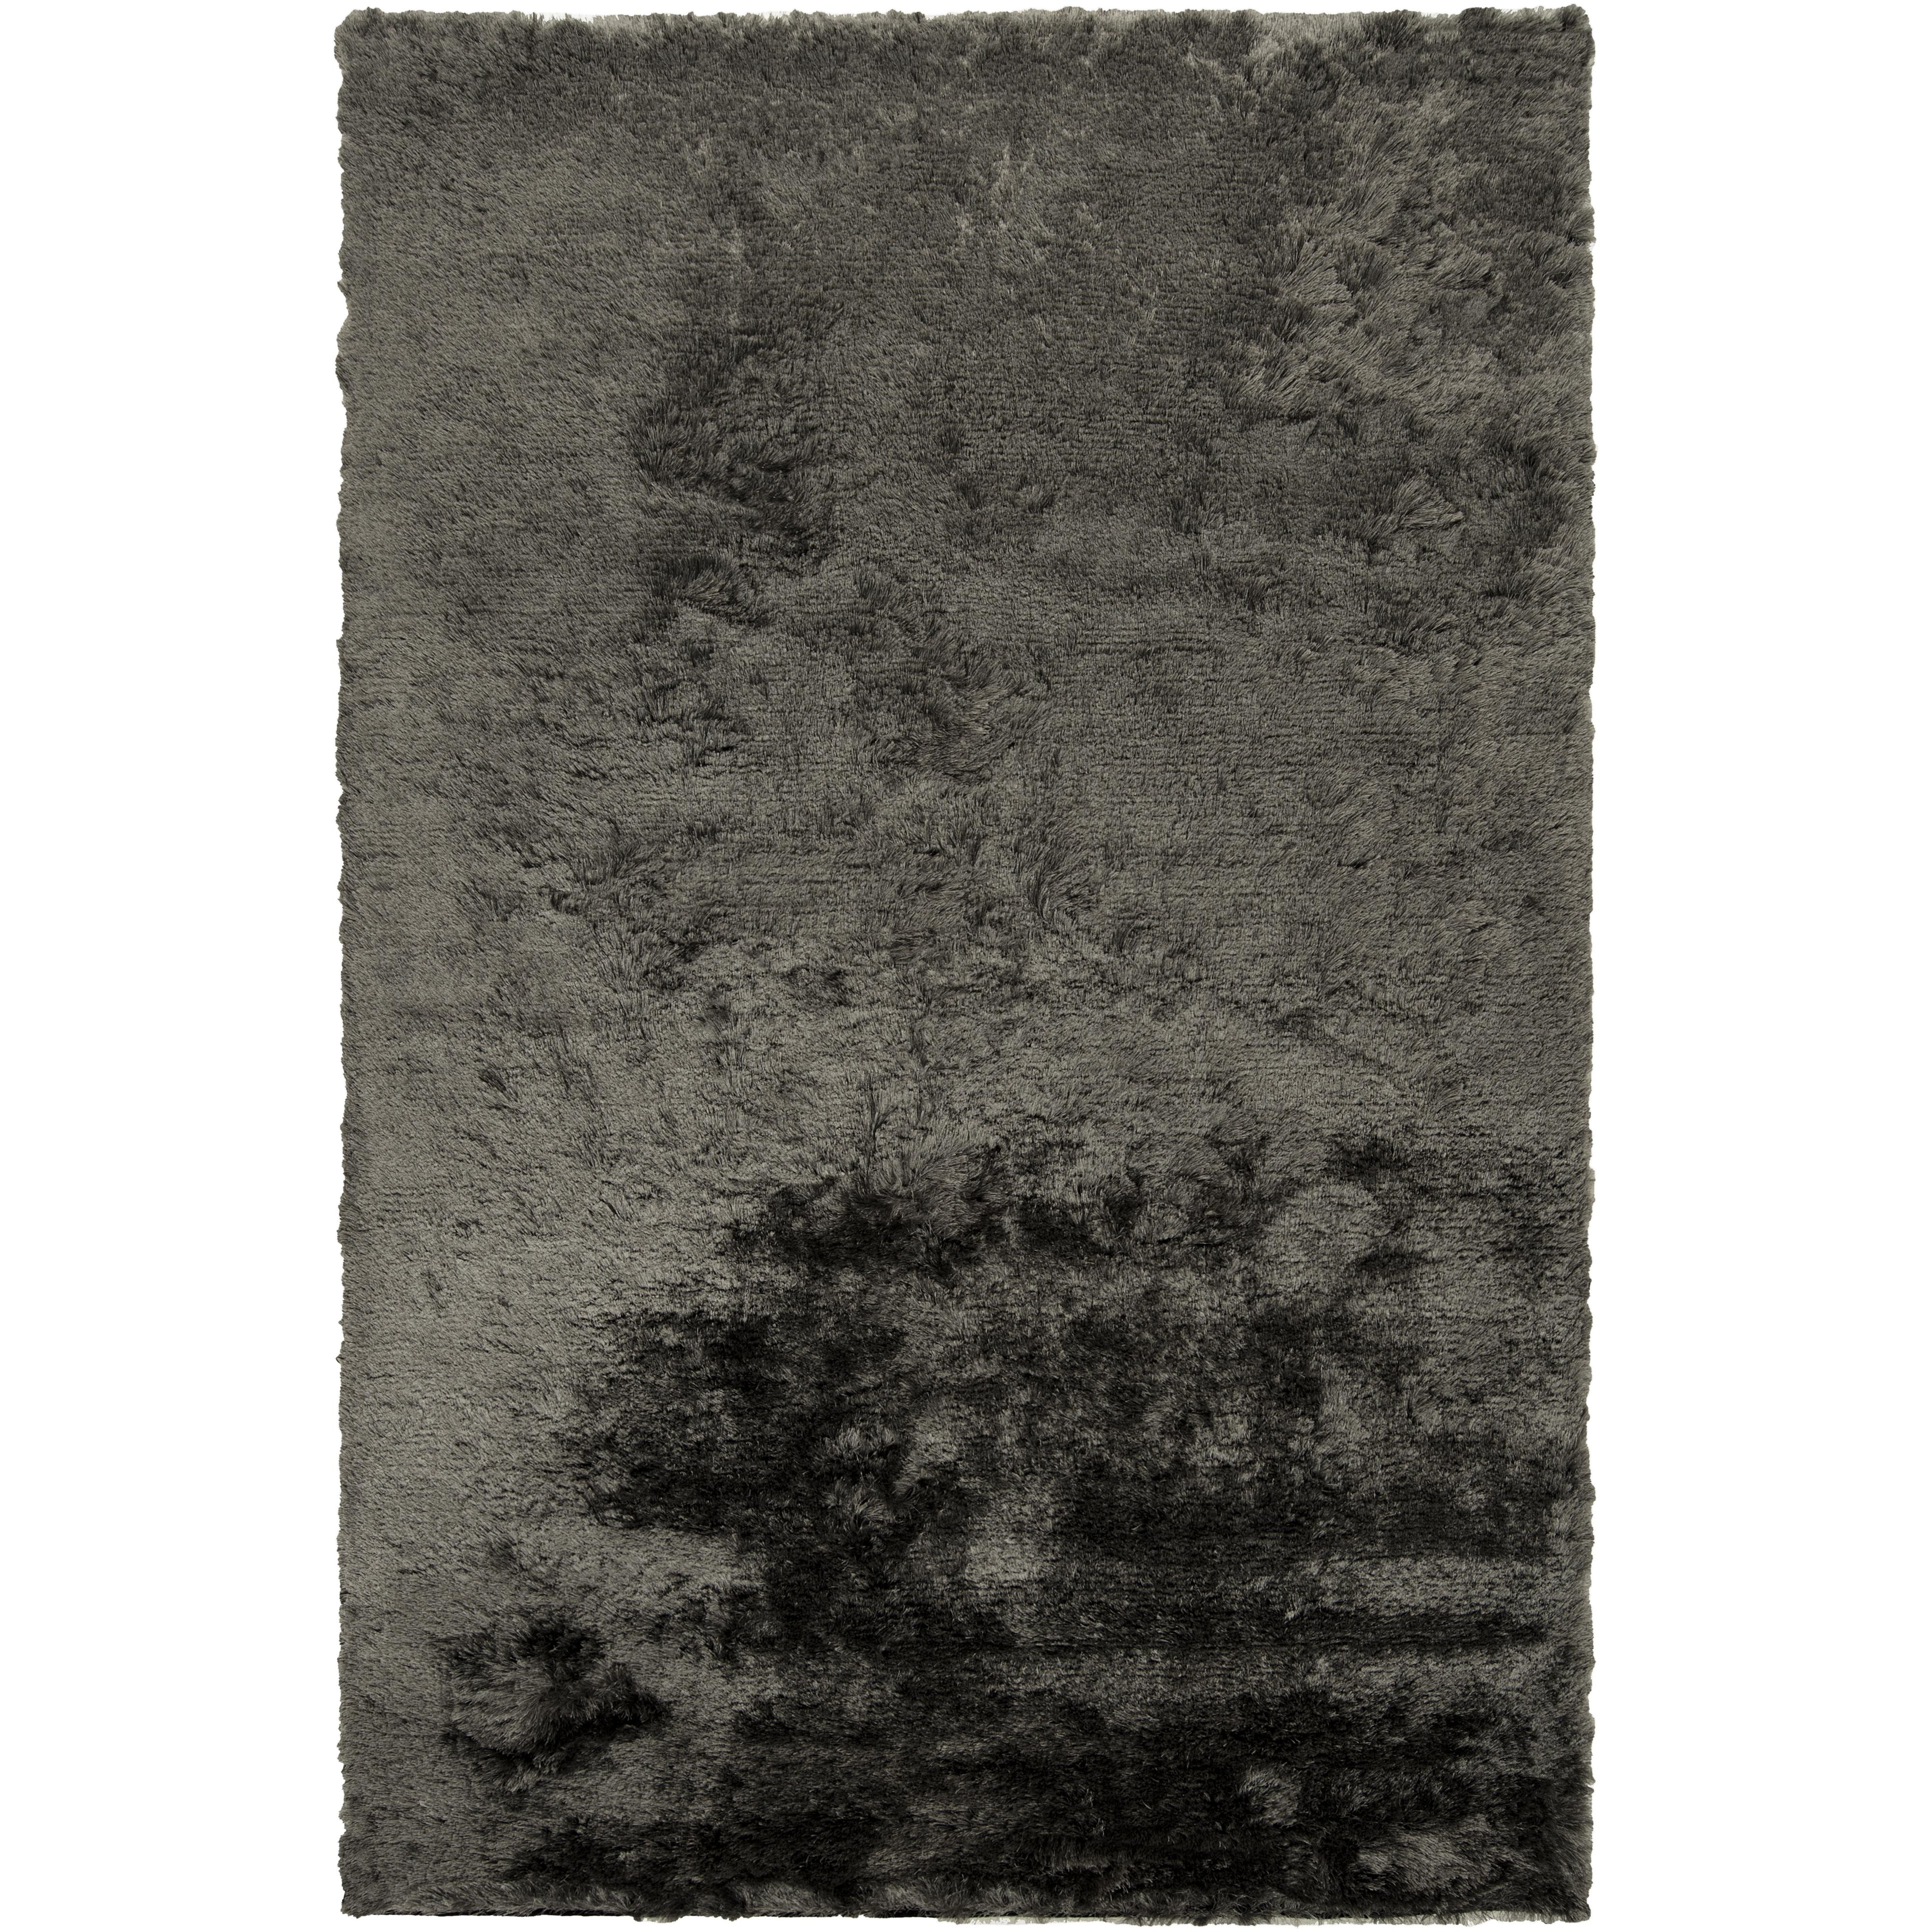 Surya Rugs Jasper 2' x 3' - Item Number: JSP8002-23